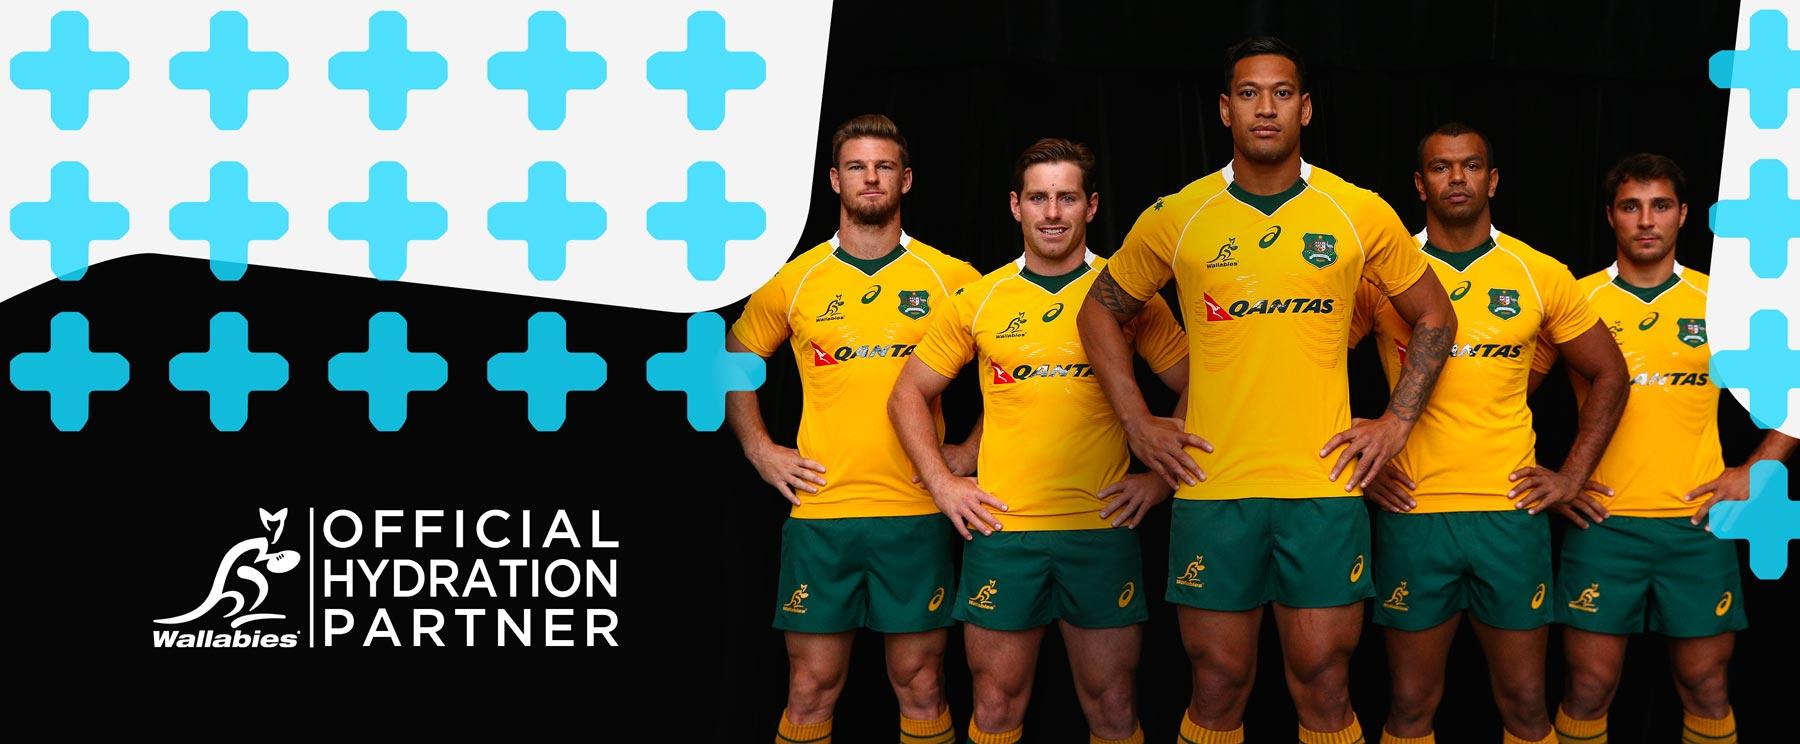 ReHydration Partner of Australian Rugby Wallabies